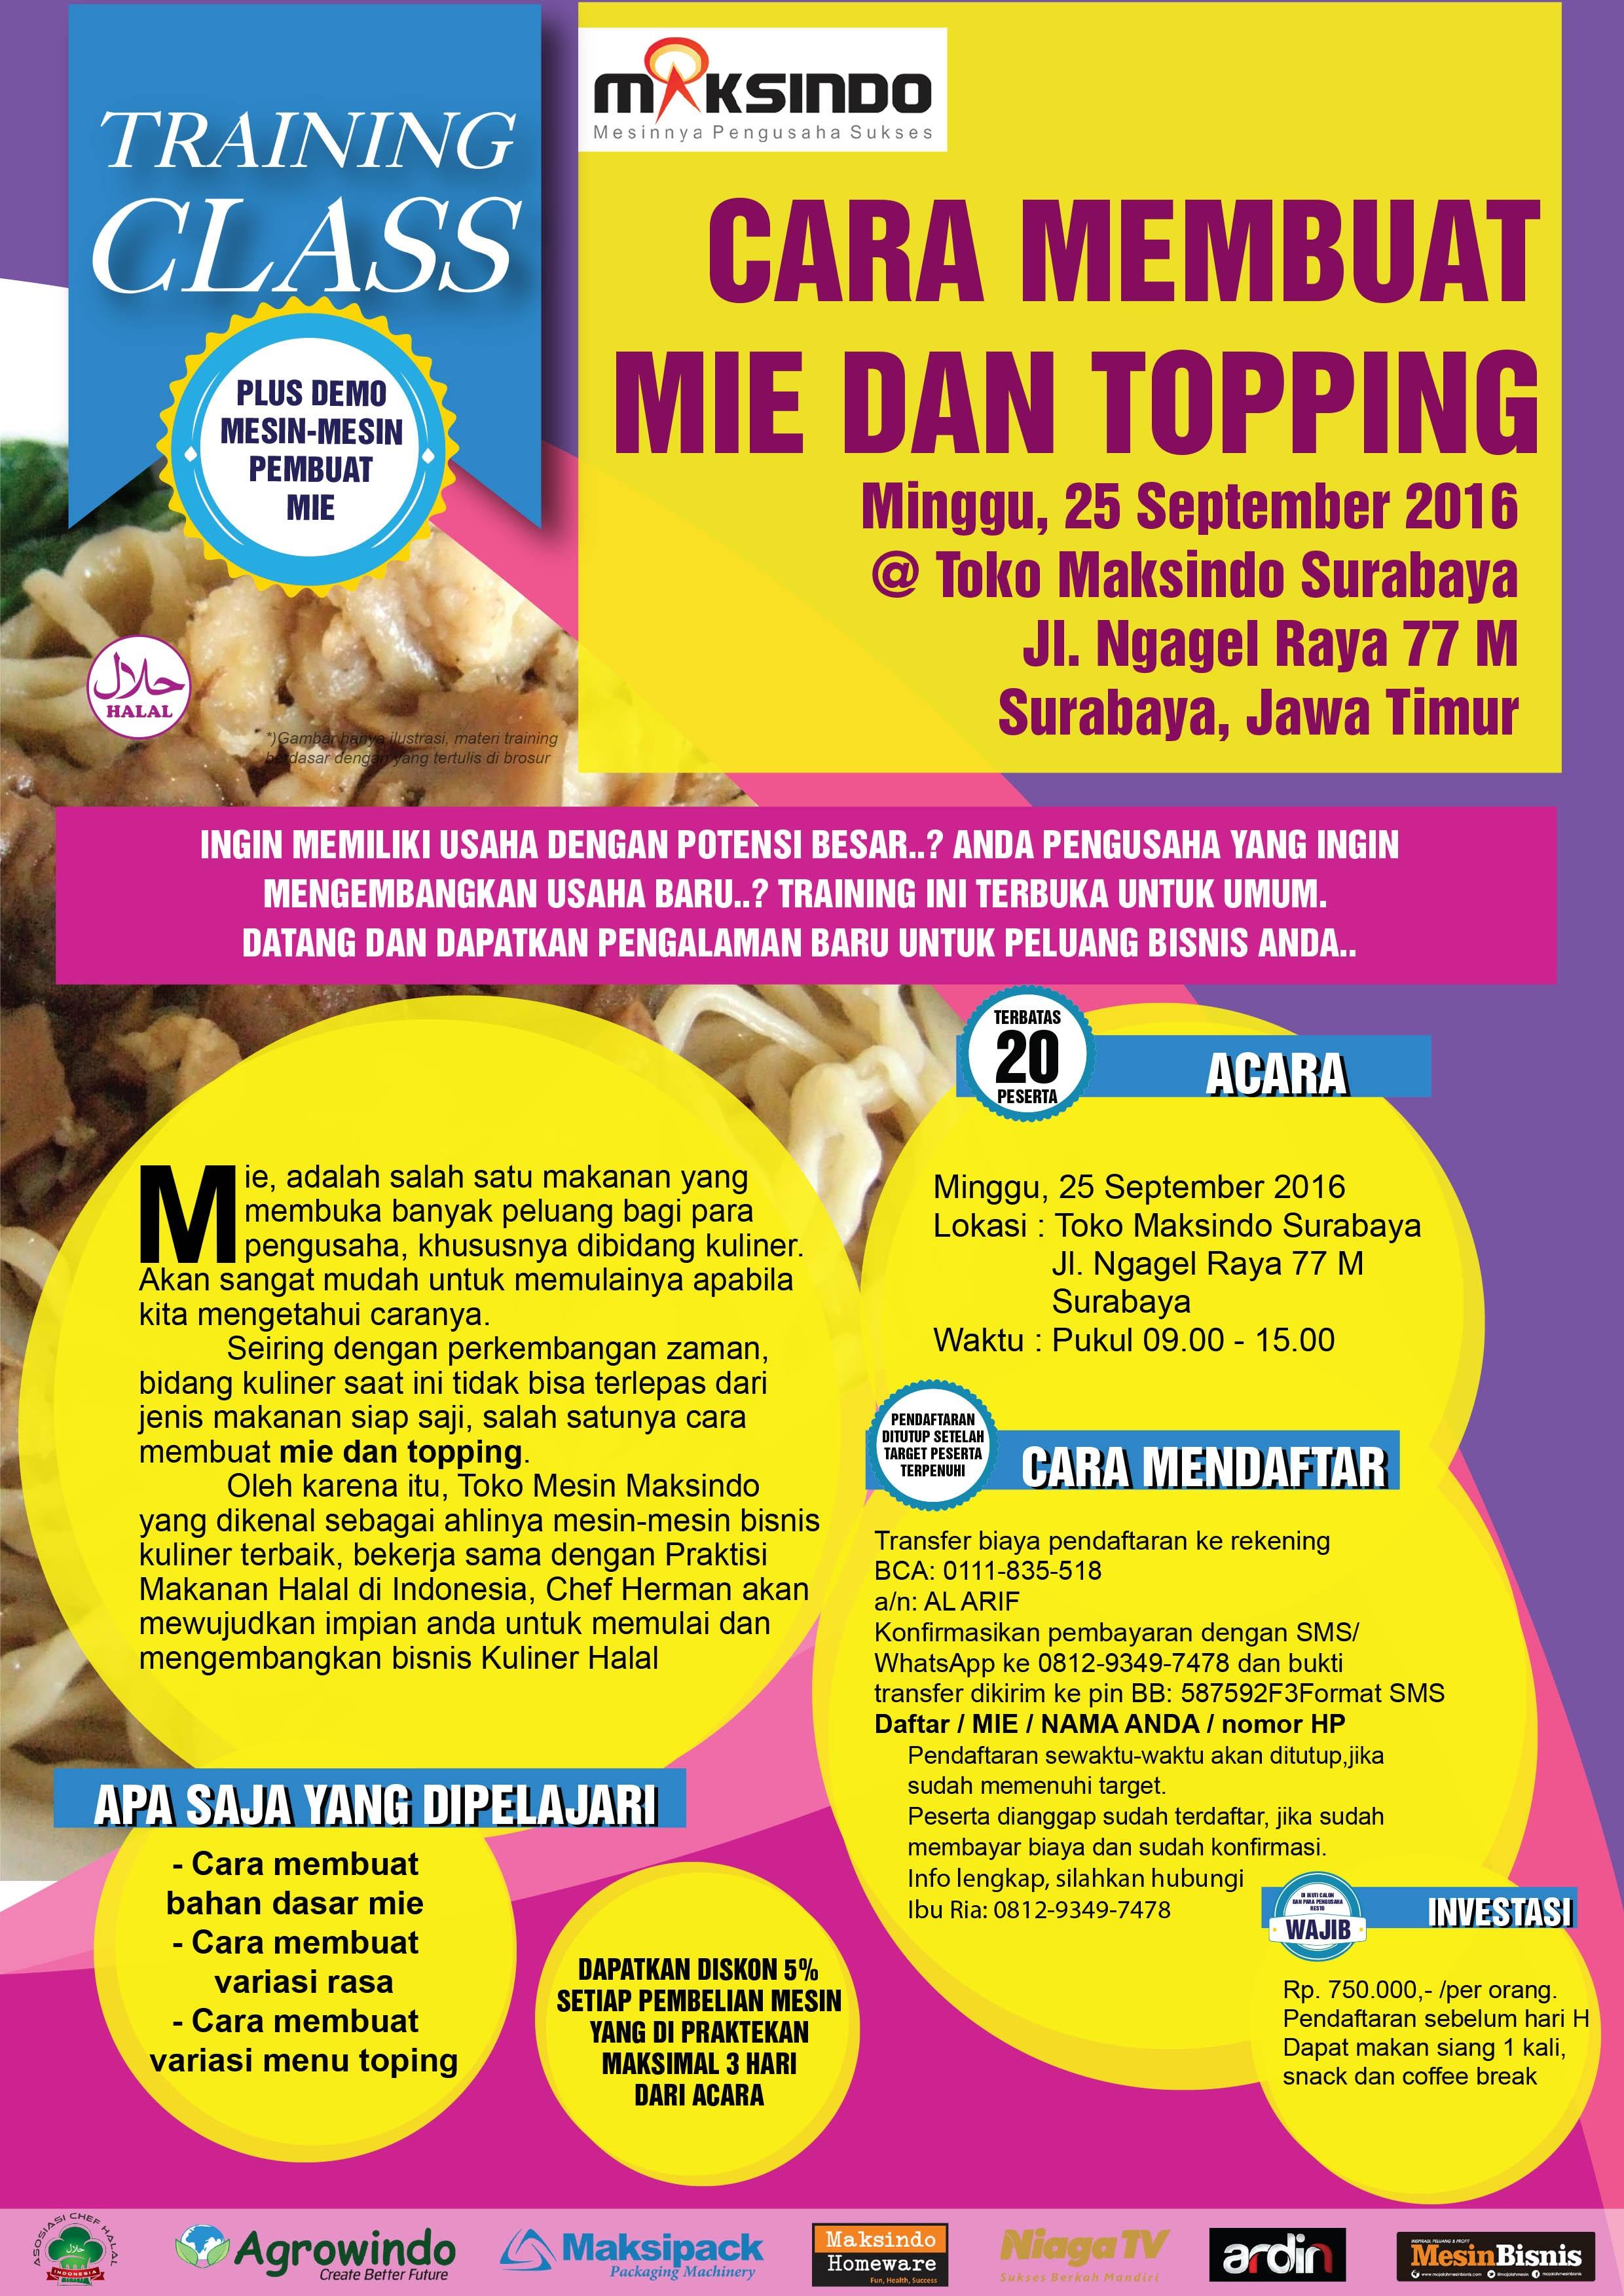 Training Usaha Mie dan Toping di Surabaya, 25 September 2016